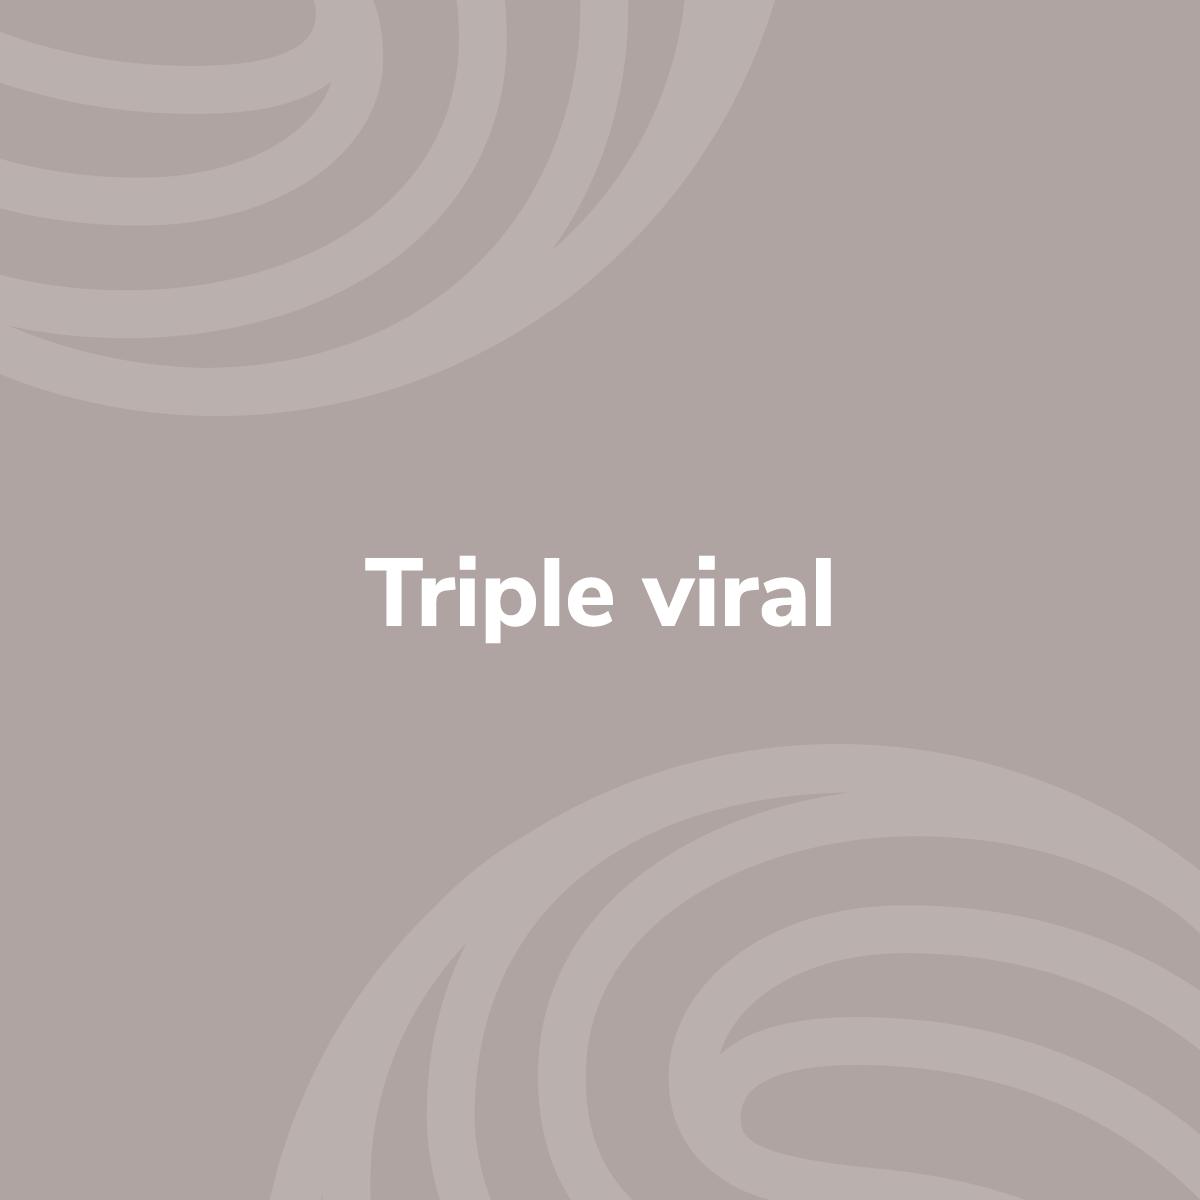 Triple viral